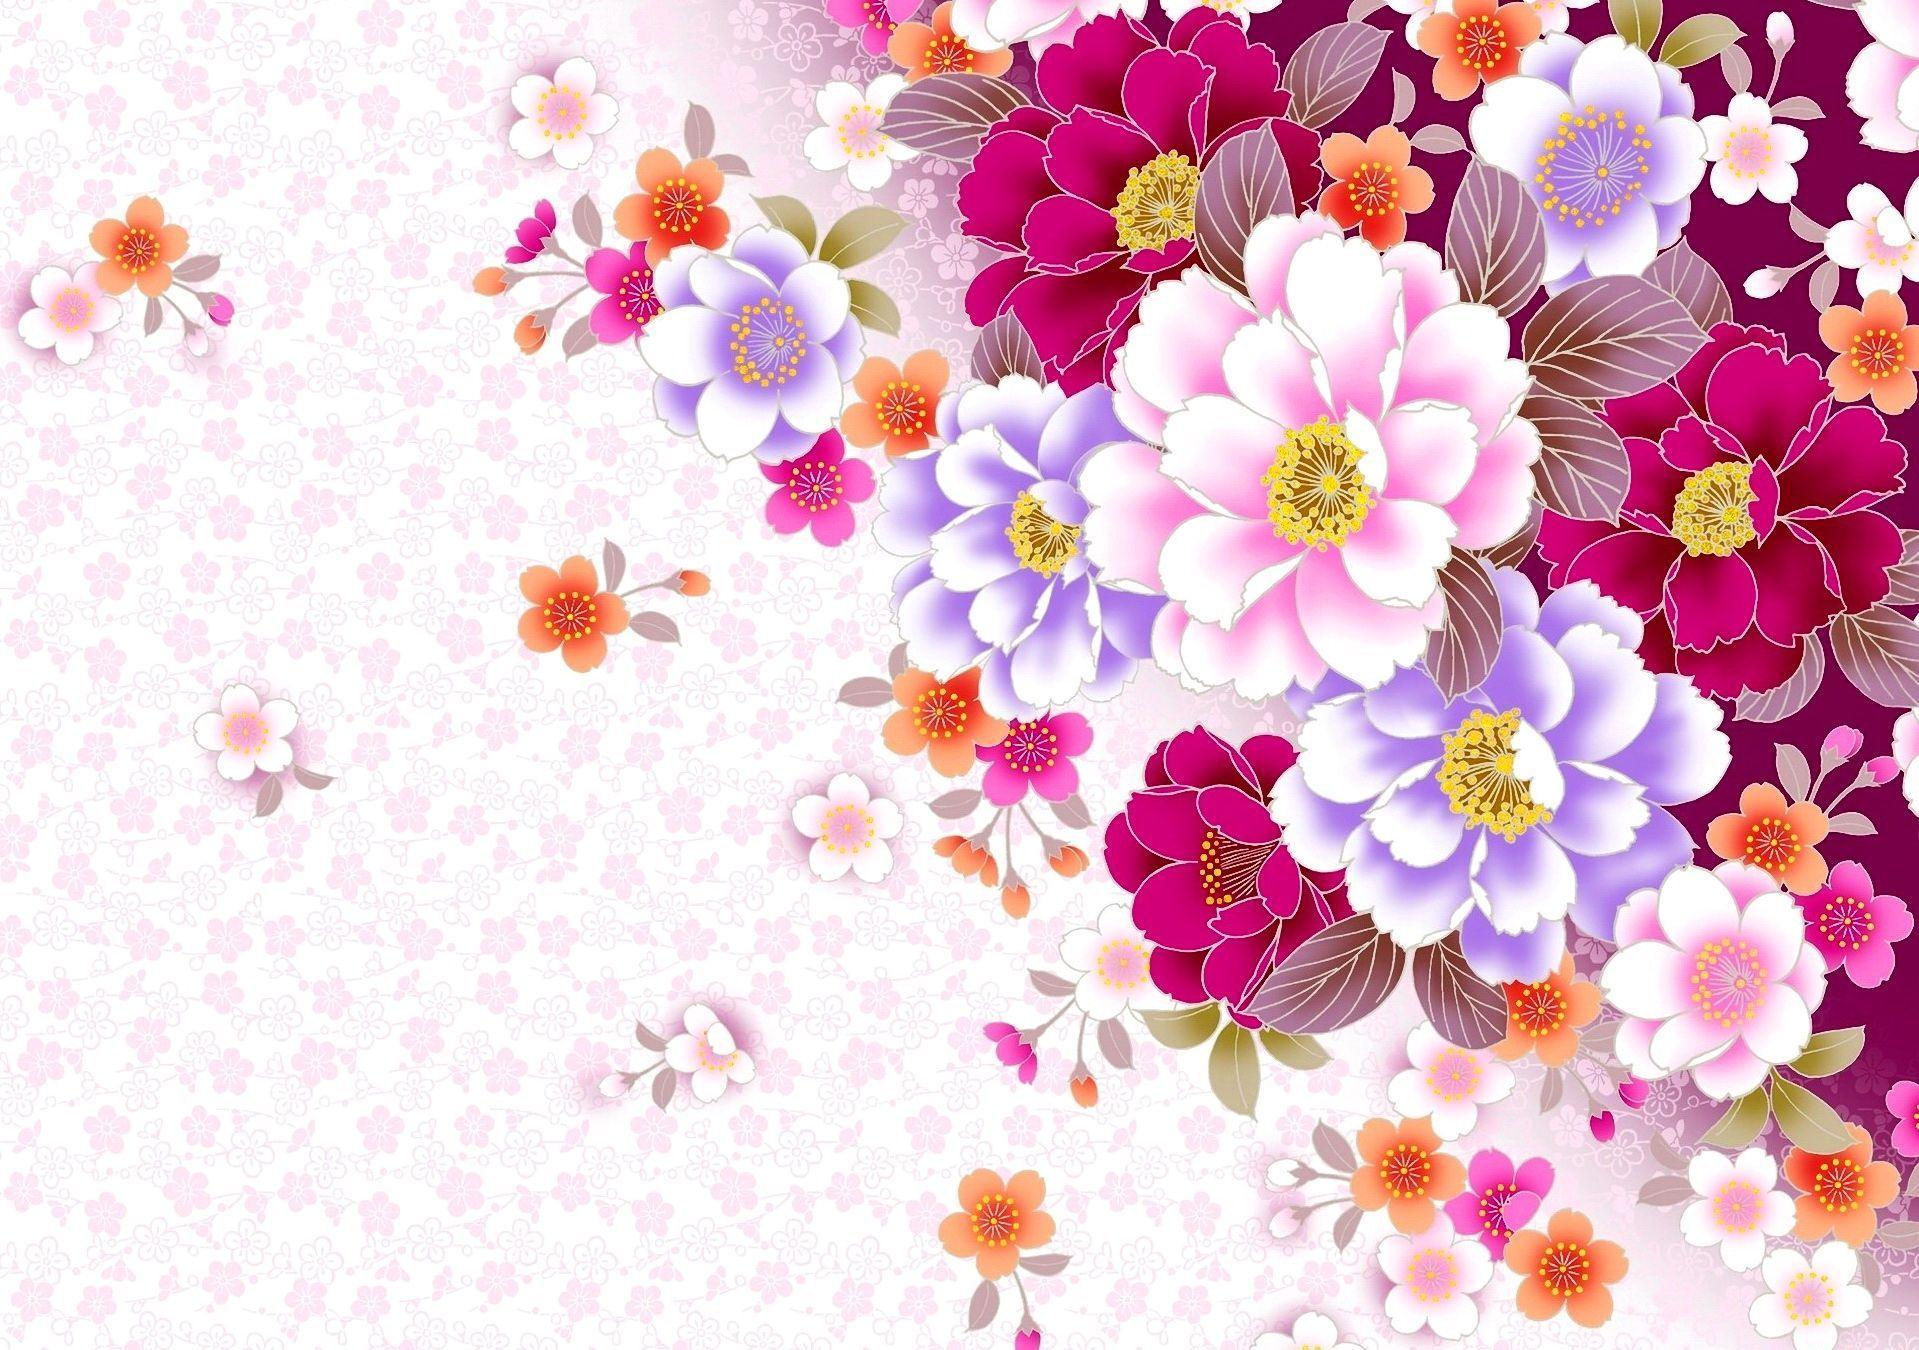 backgrounds flower desktop with free wallpaper nature flowers 1920a—1200 desktop flower backgrounds 53